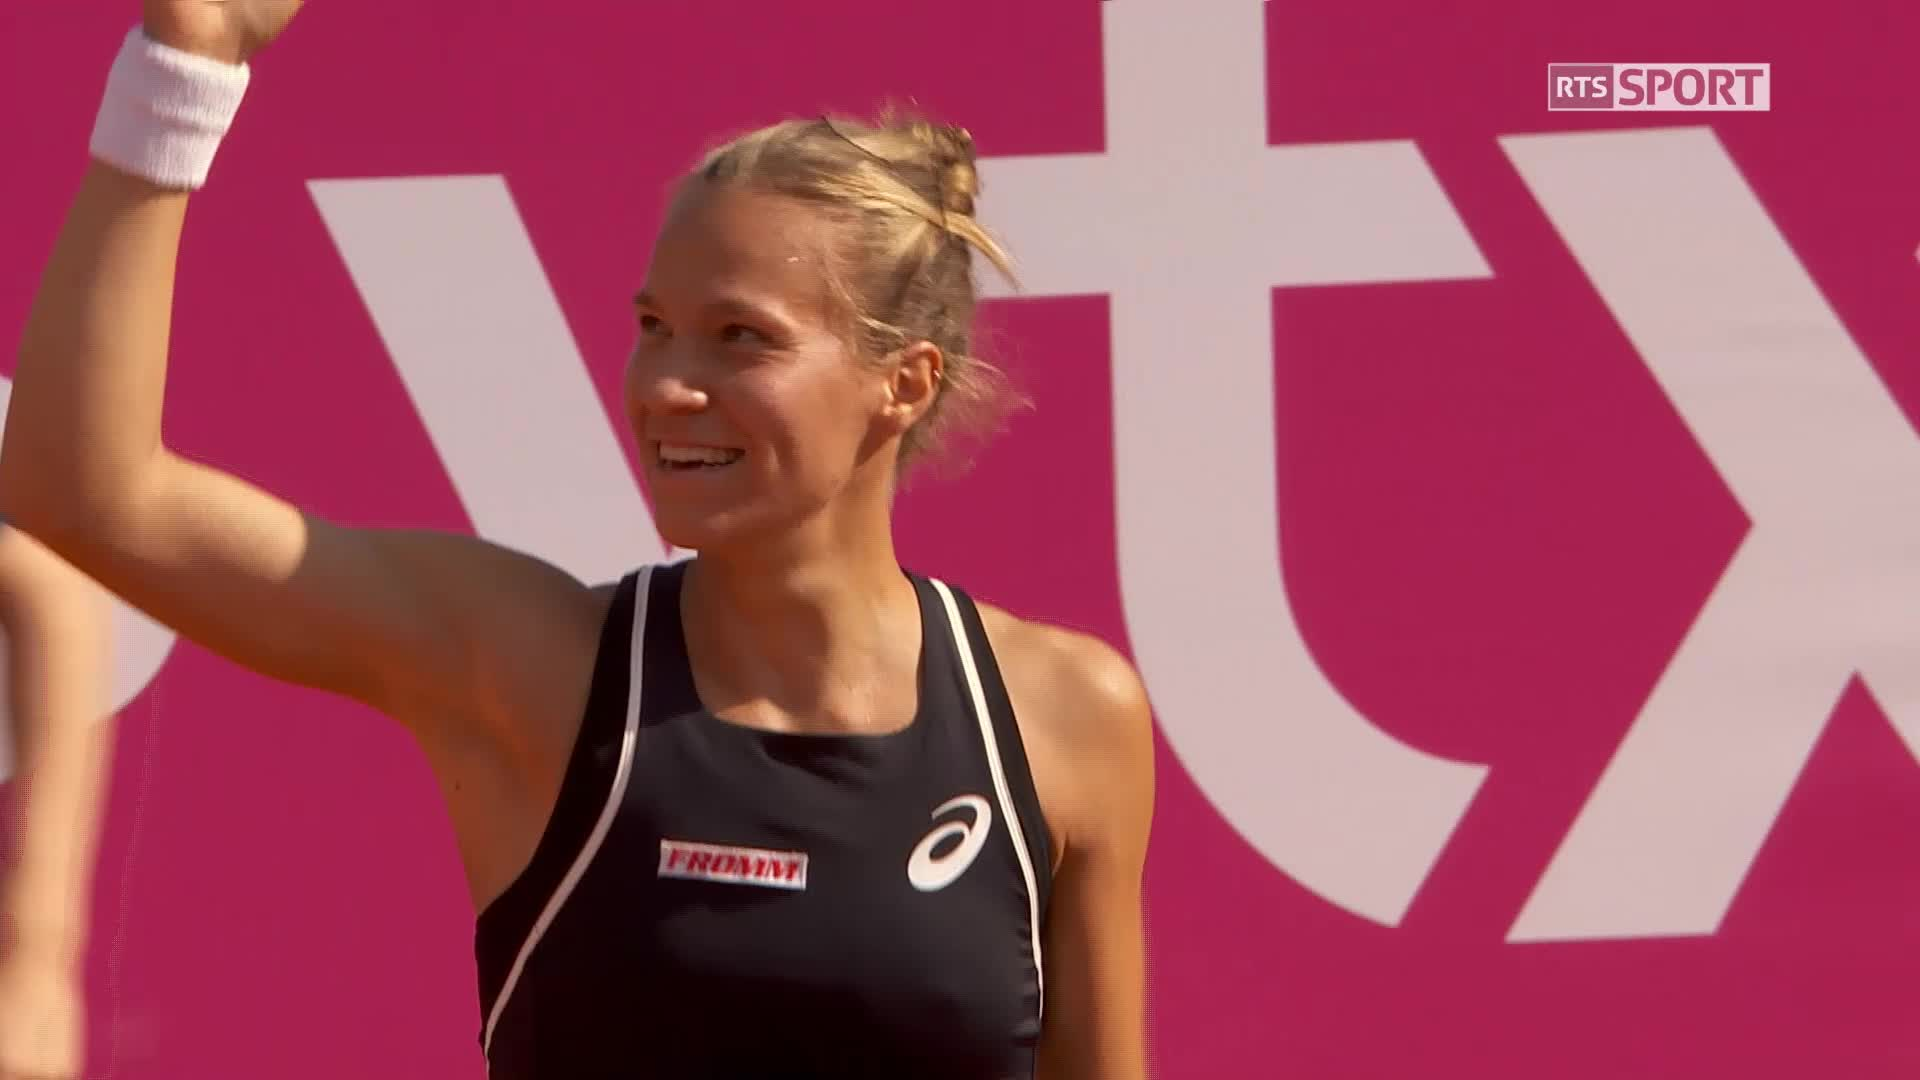 Tennis : Bacsinszky chute au classement WTA